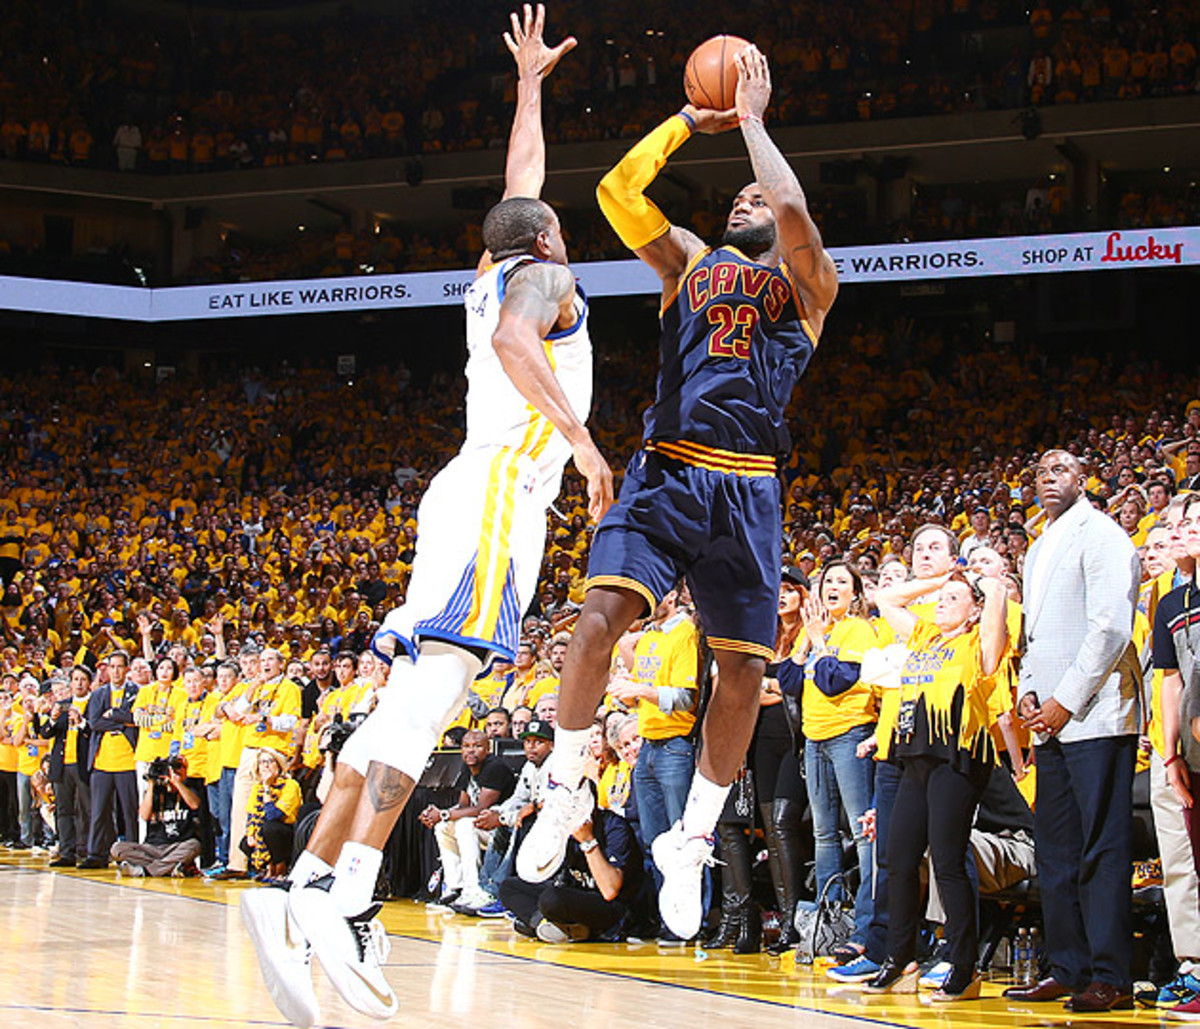 lebron-james-44-points-cavaliers-warriors-nba-finals-game-1.jpg